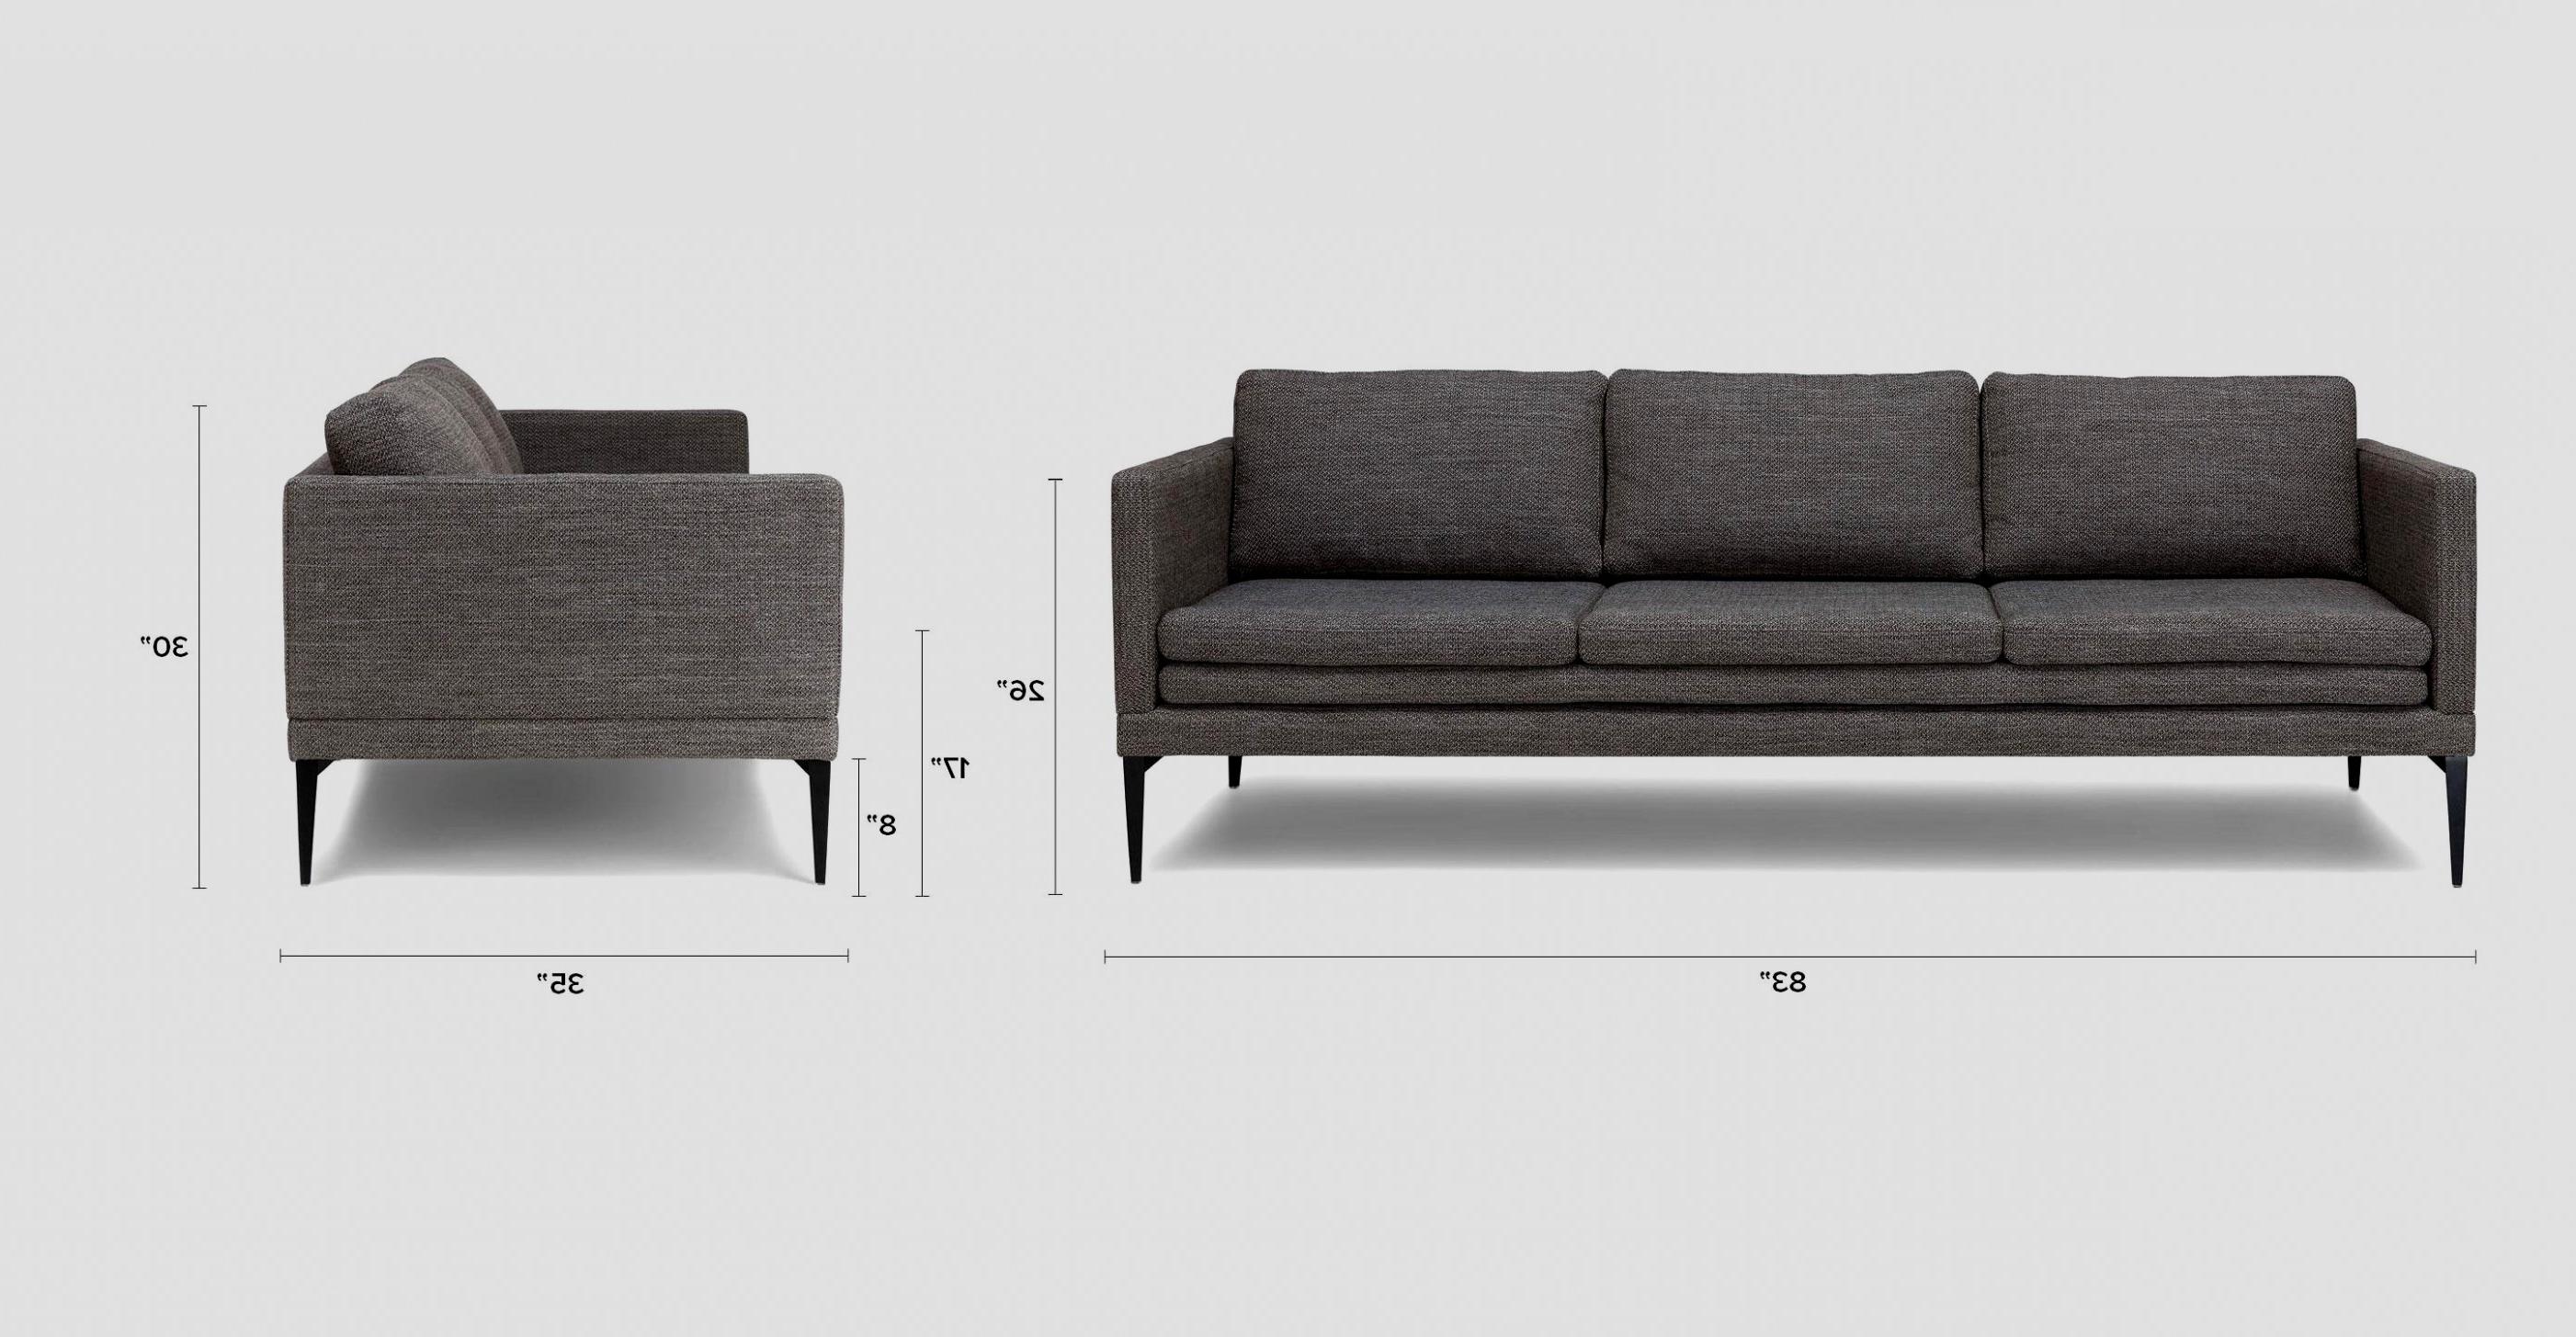 Sofas Modulares Conforama Ftd8 sofas Cheslong Conforama Bello Ikea Bettsofa Einzigartig sofa 140